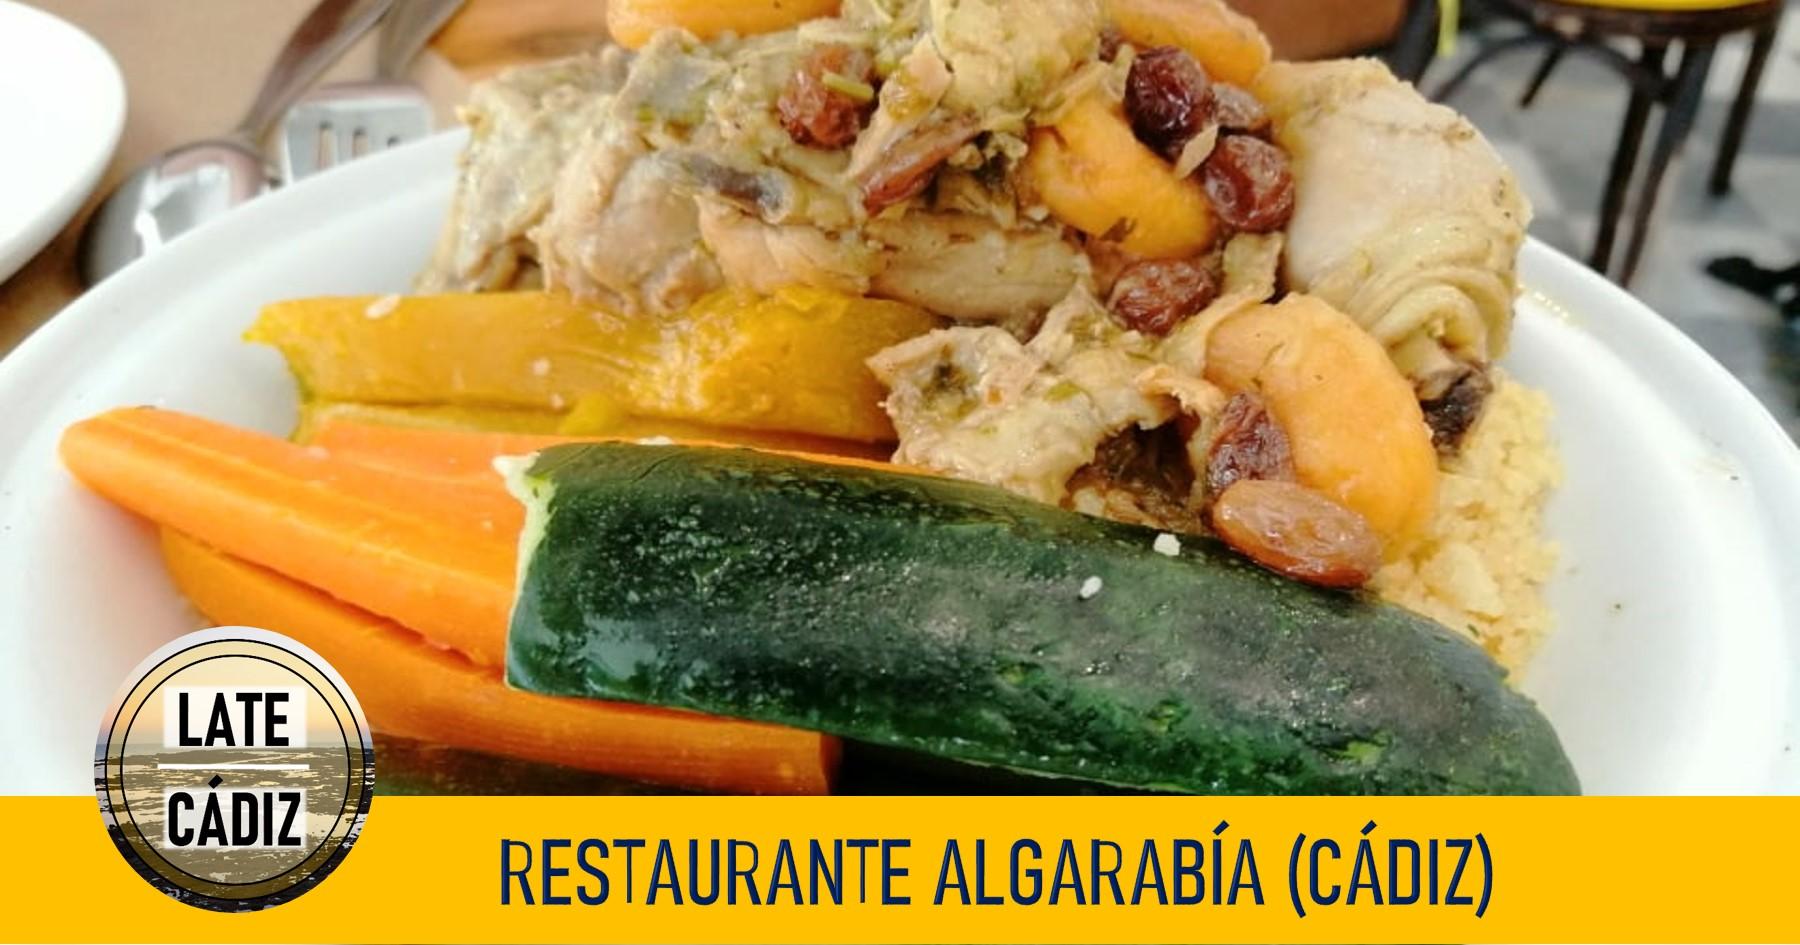 restaurante algarabía cádiz (0)